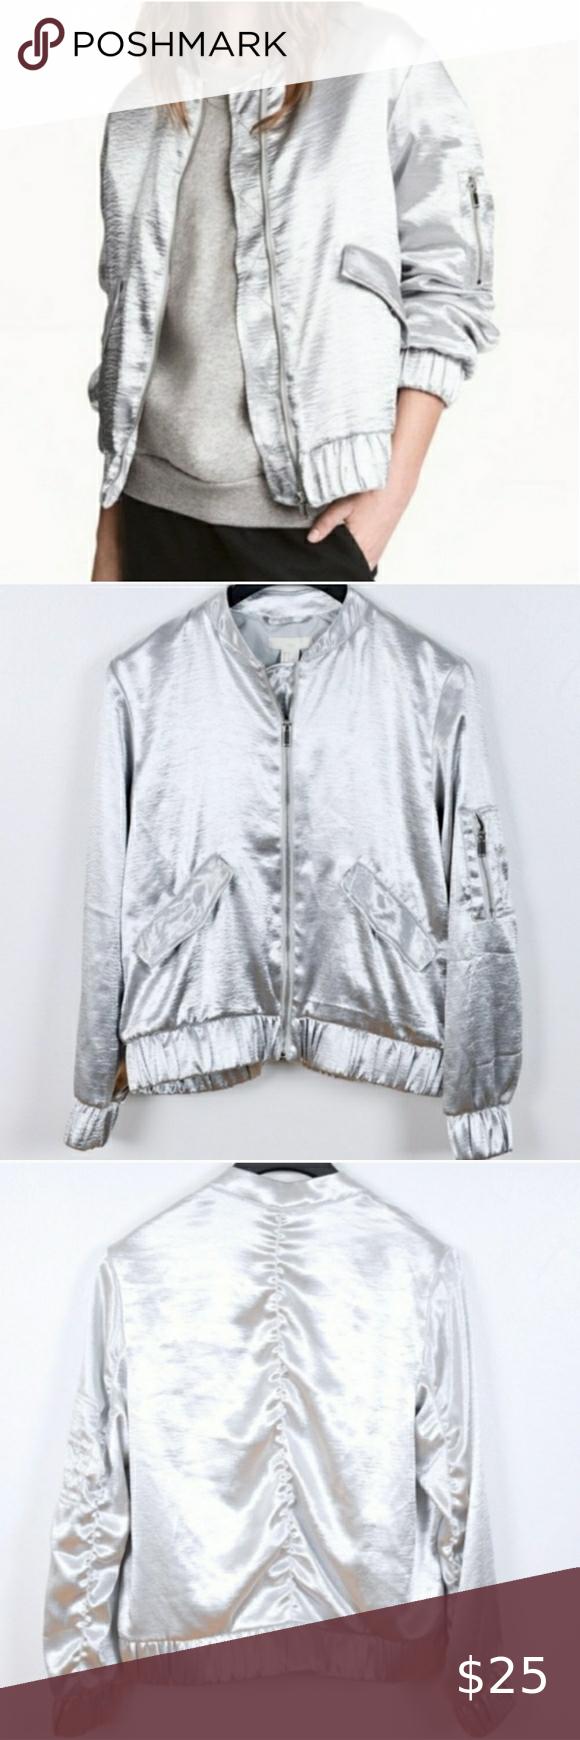 H M Bomber Jacket Satin Bomber Jacket Clothes Design Fashion [ 1740 x 580 Pixel ]